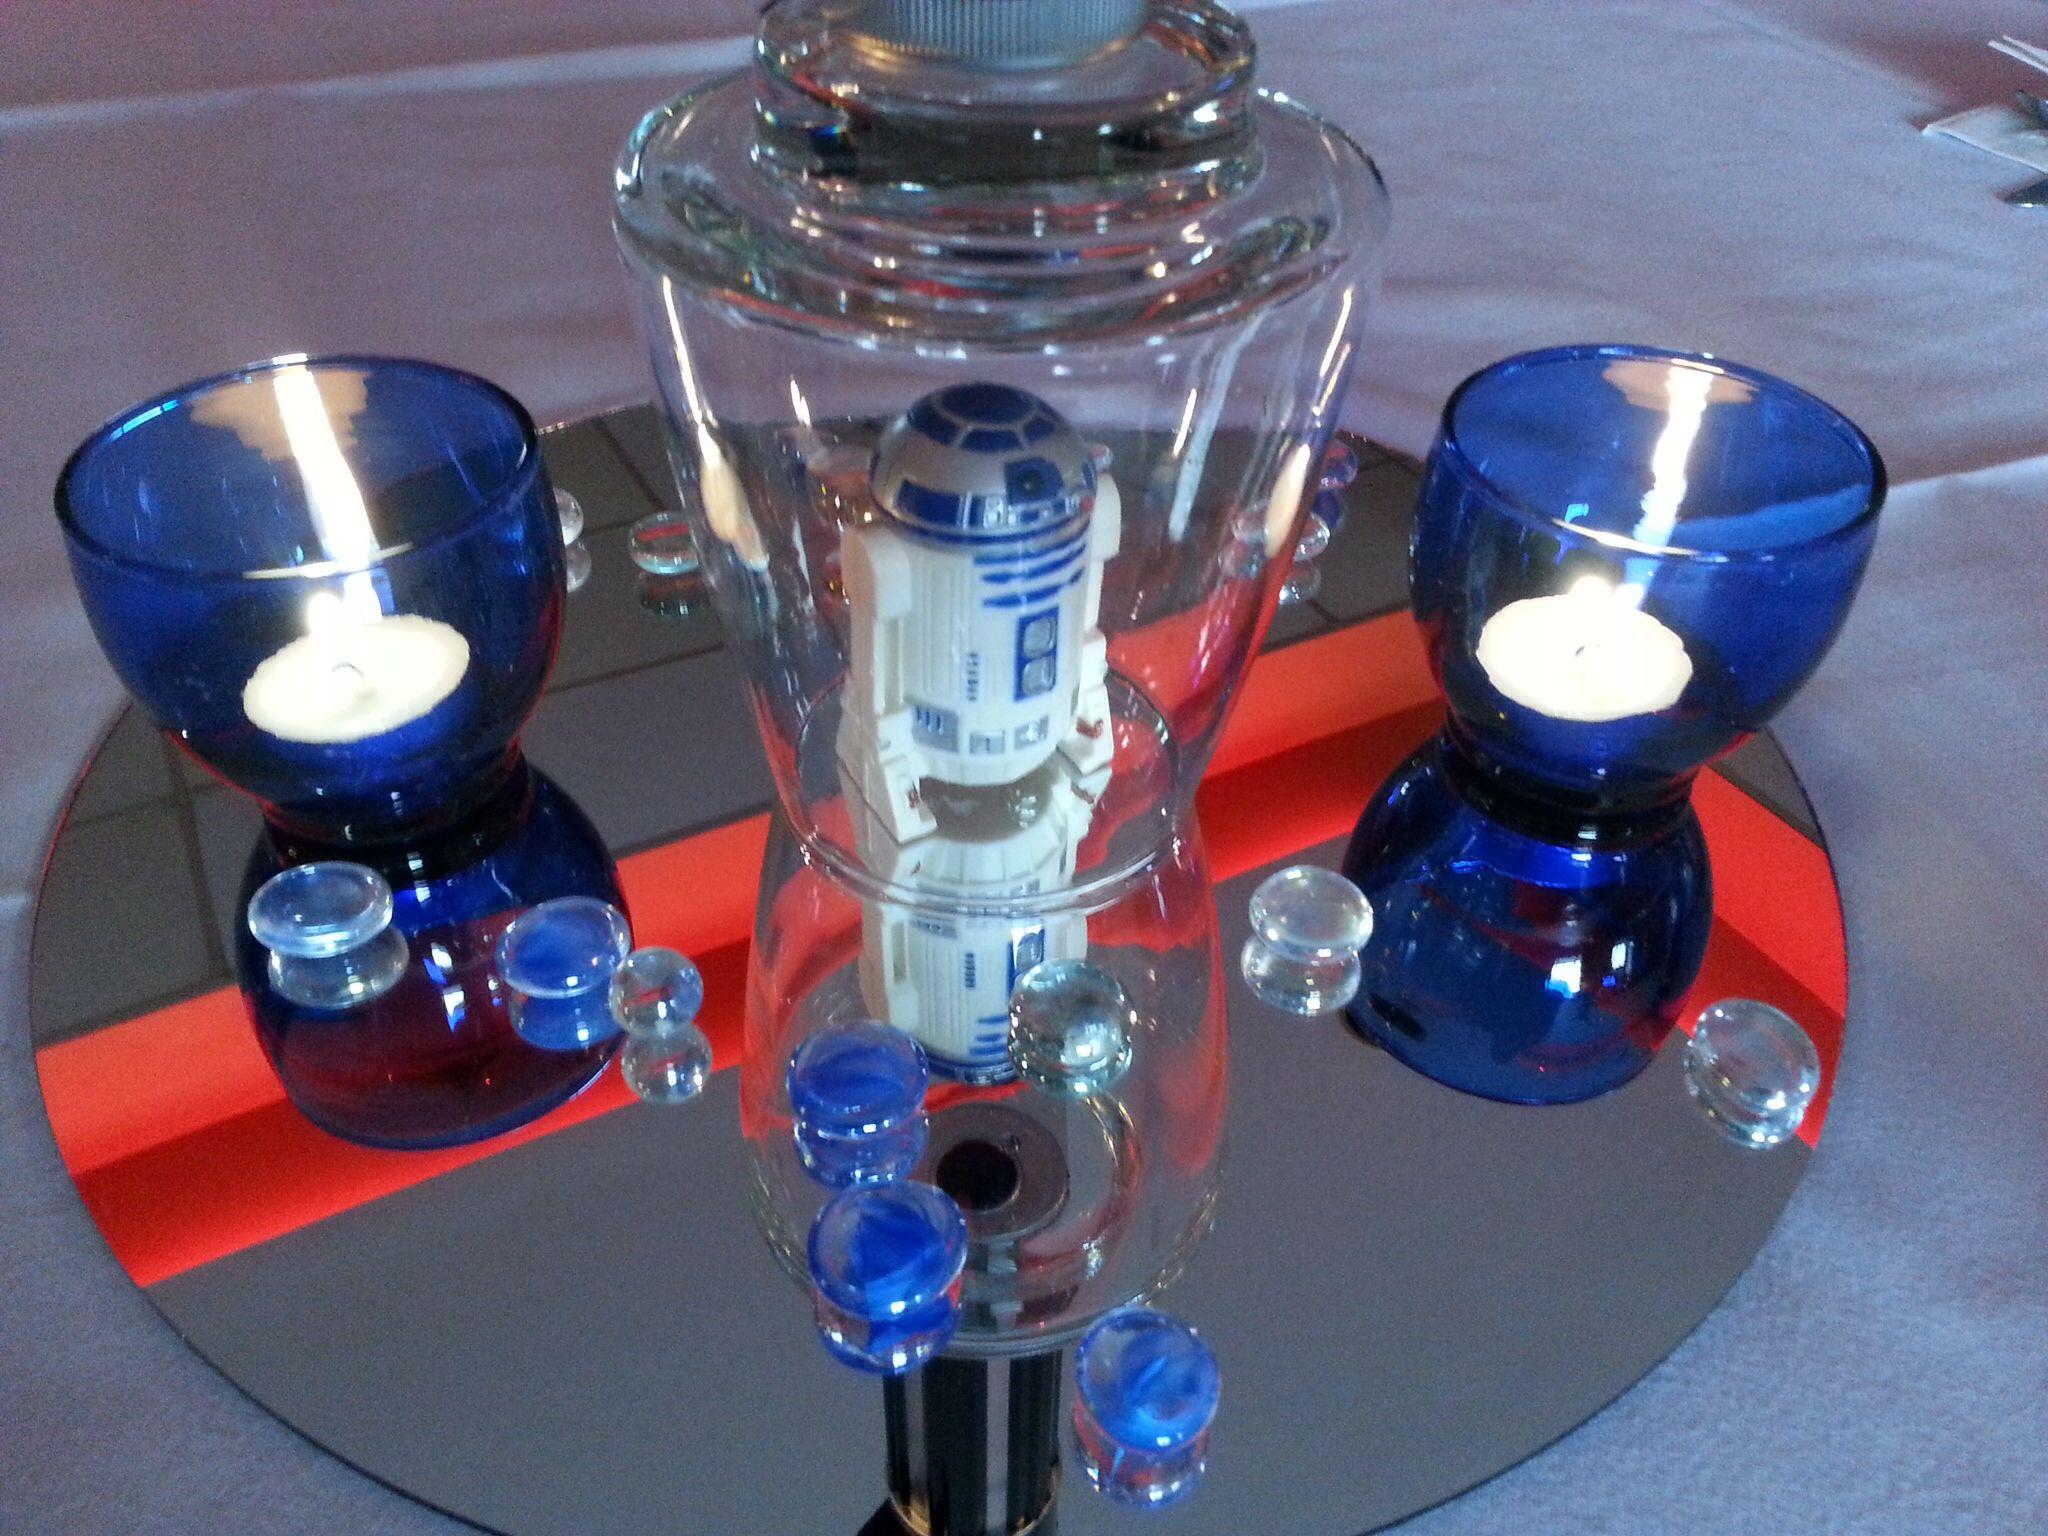 Google themes star wars - Star Wars Theme Centerpiece R2d2 Credit C My Style Event Planning Llc